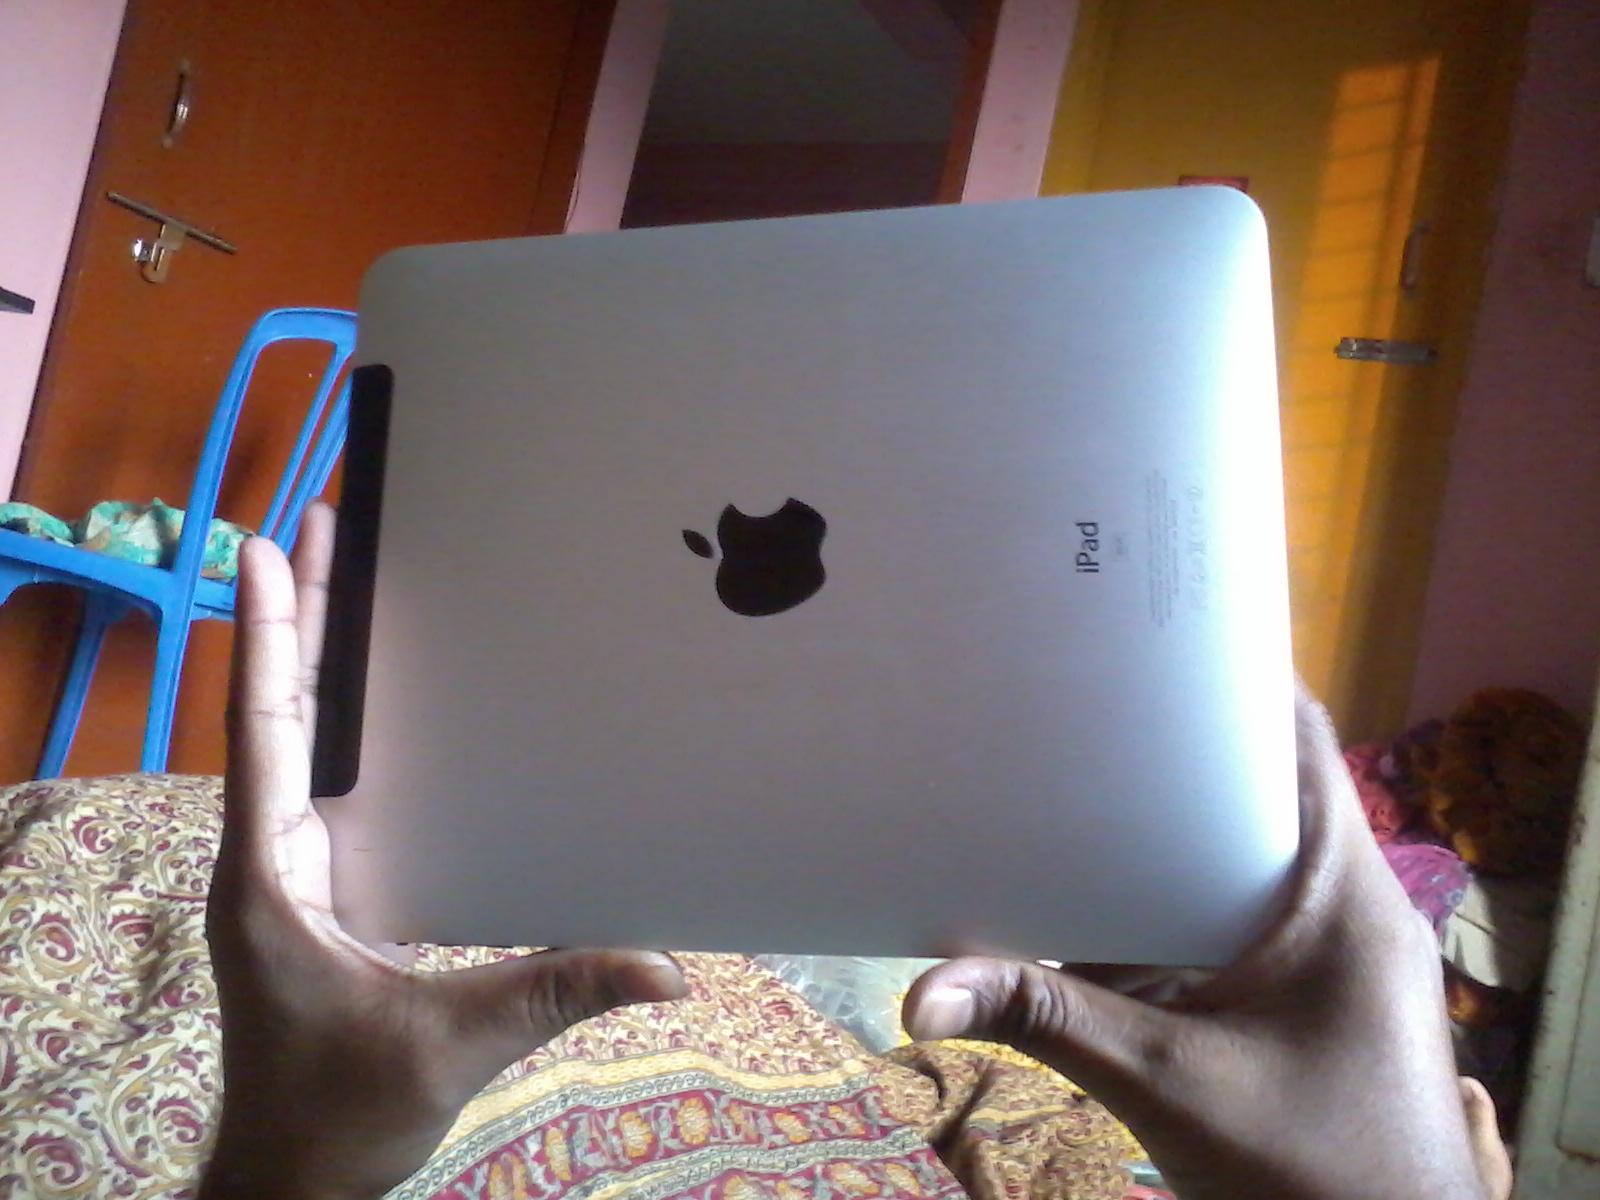 Apple Ipad 1 3g Wifi 16gb